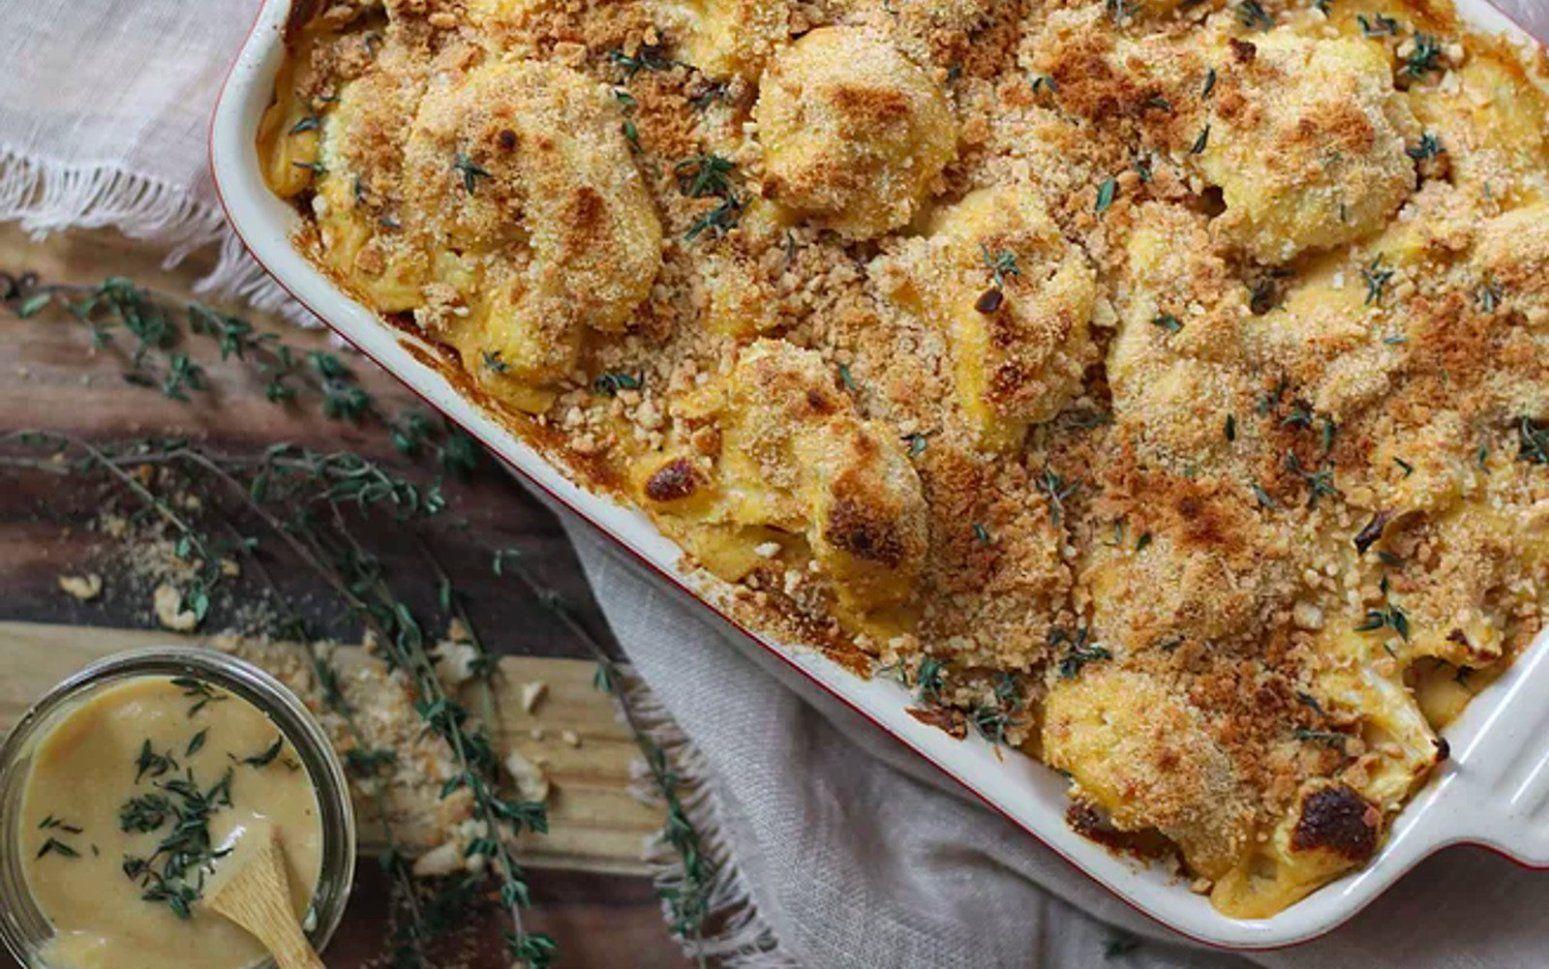 Cheesy Cauliflower Bake With Bread Crumbs And Thyme Vegan Gluten